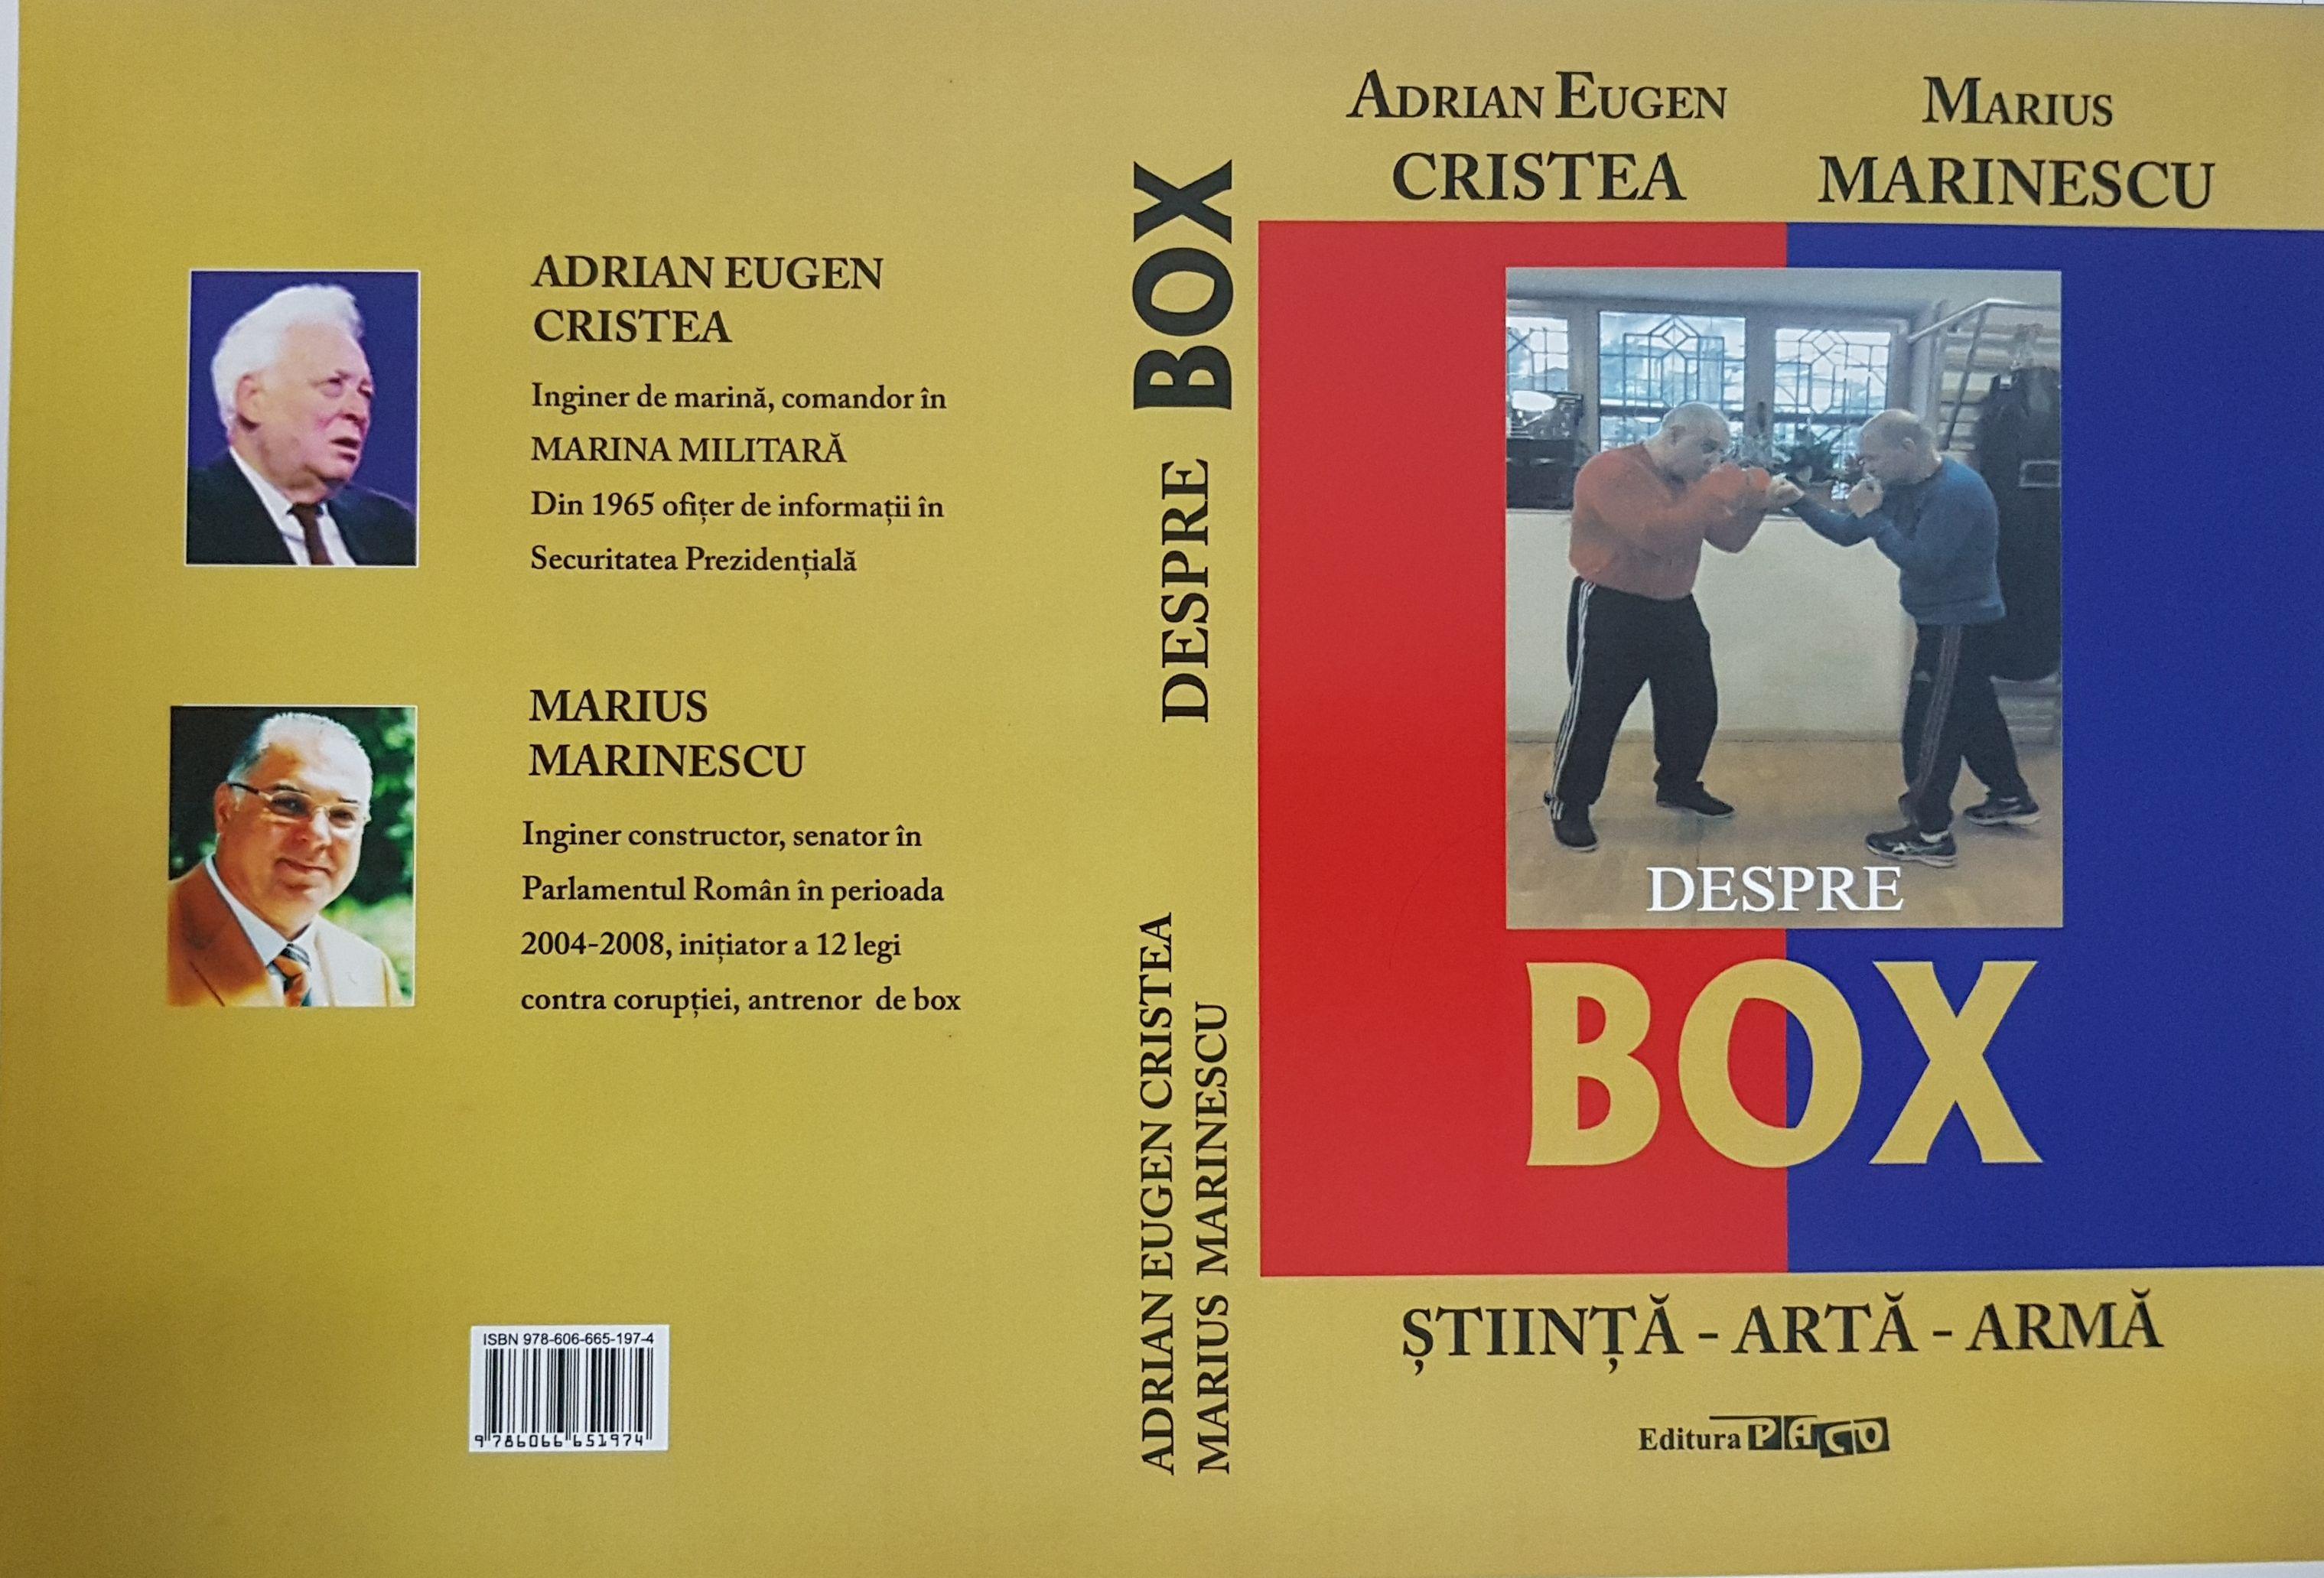 MARIUS MARINESCU – DESPRE BOX STIINTA-ARTA-ARMA